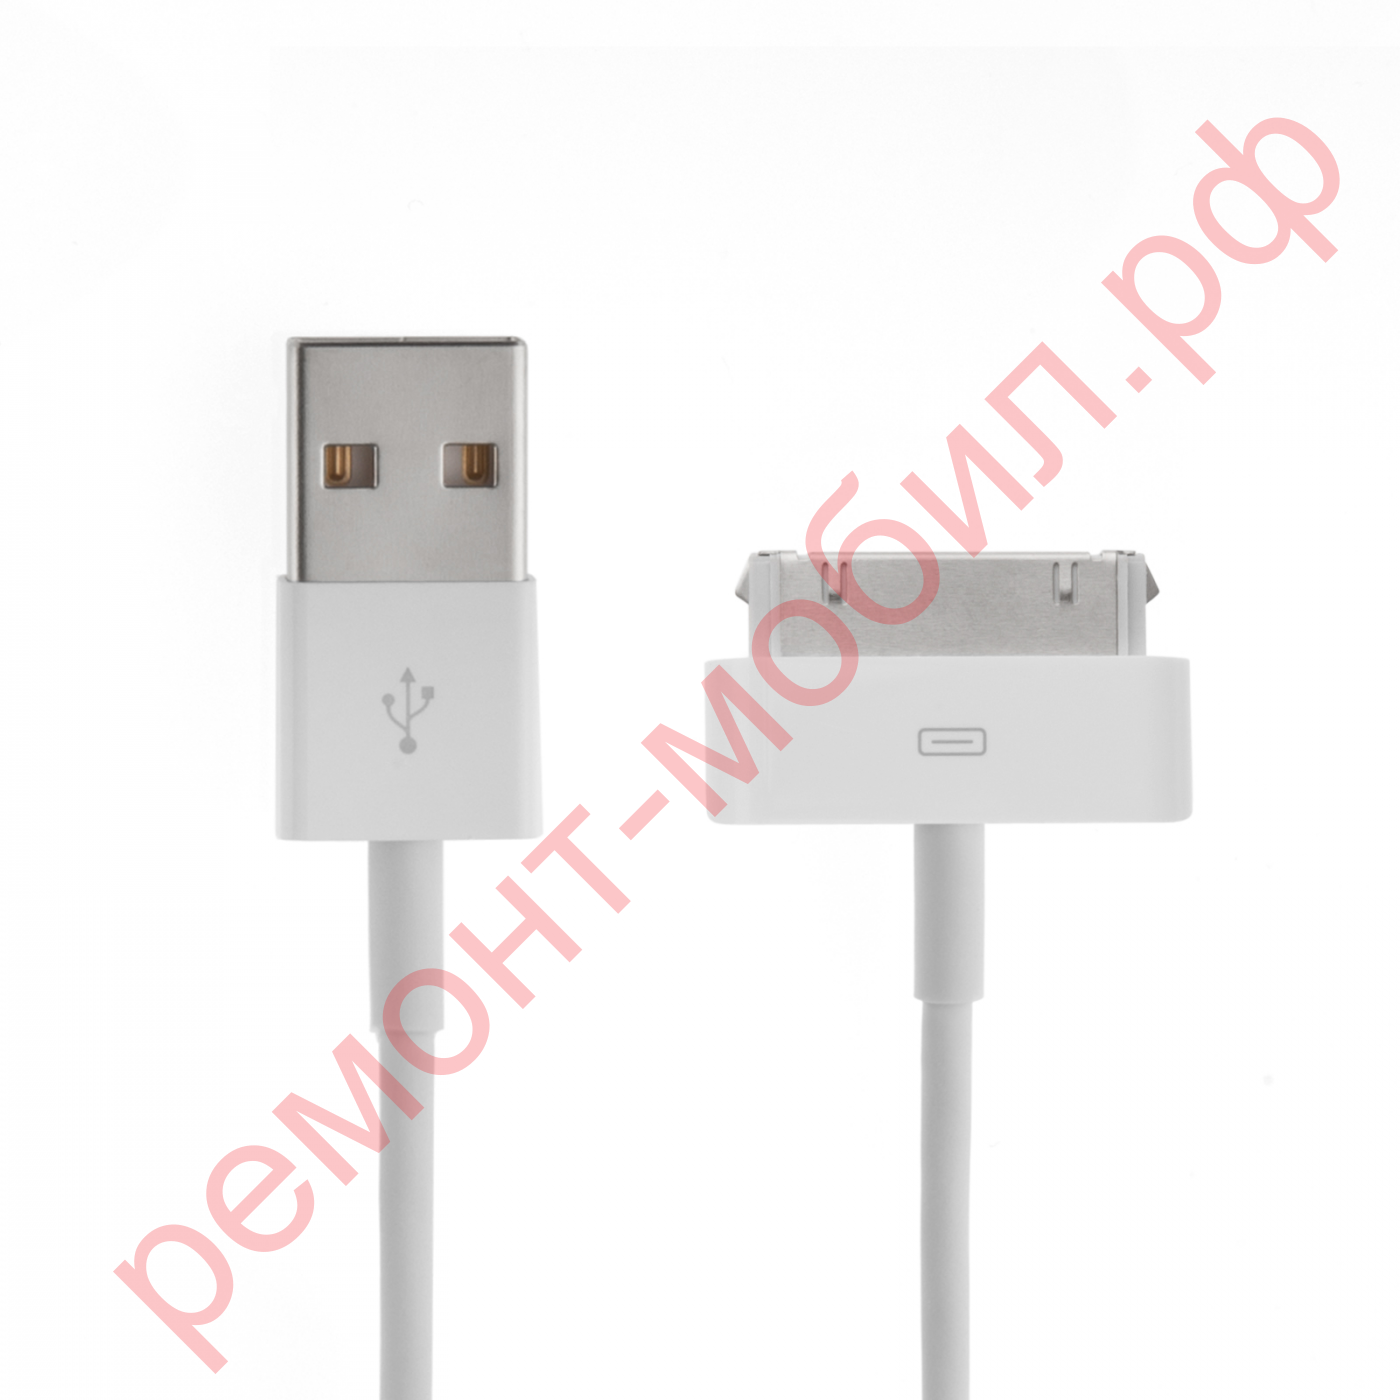 Кабель для iPhone 3GS / 4 / 4S / iPad 2 / iPad 3